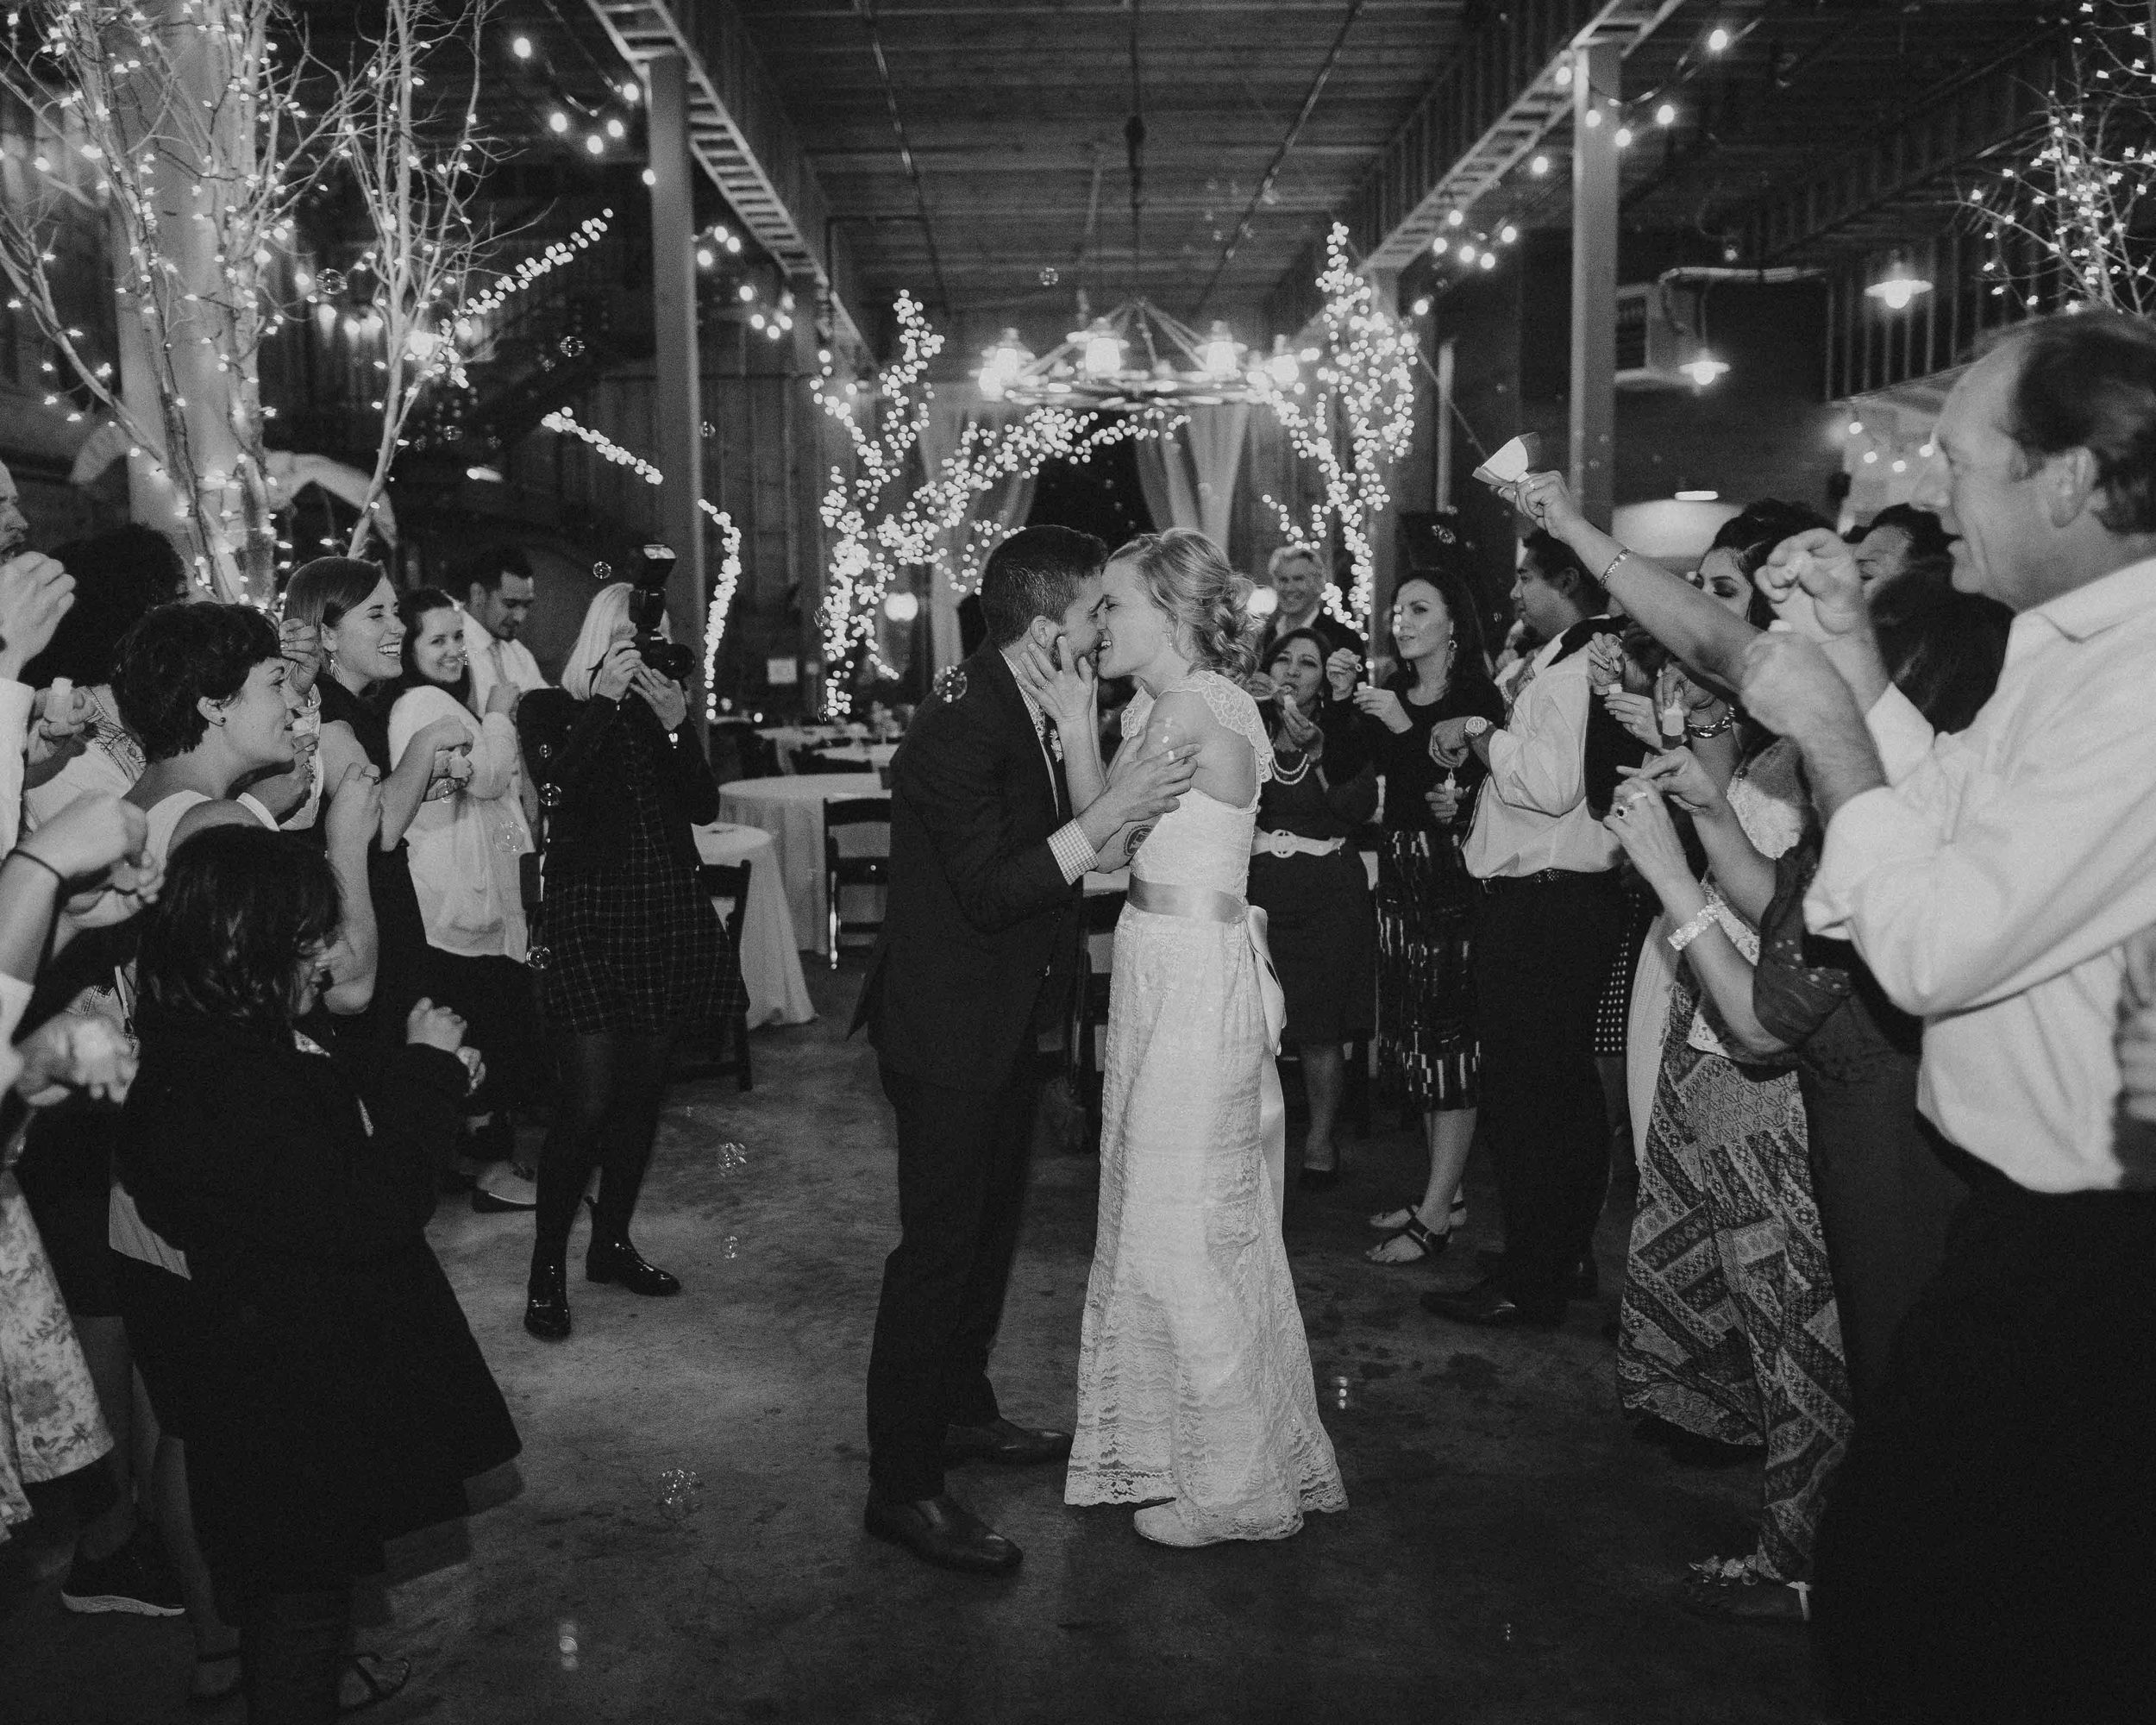 Salt-Lake-City-Utah-Wedding-Photographer-61.jpg